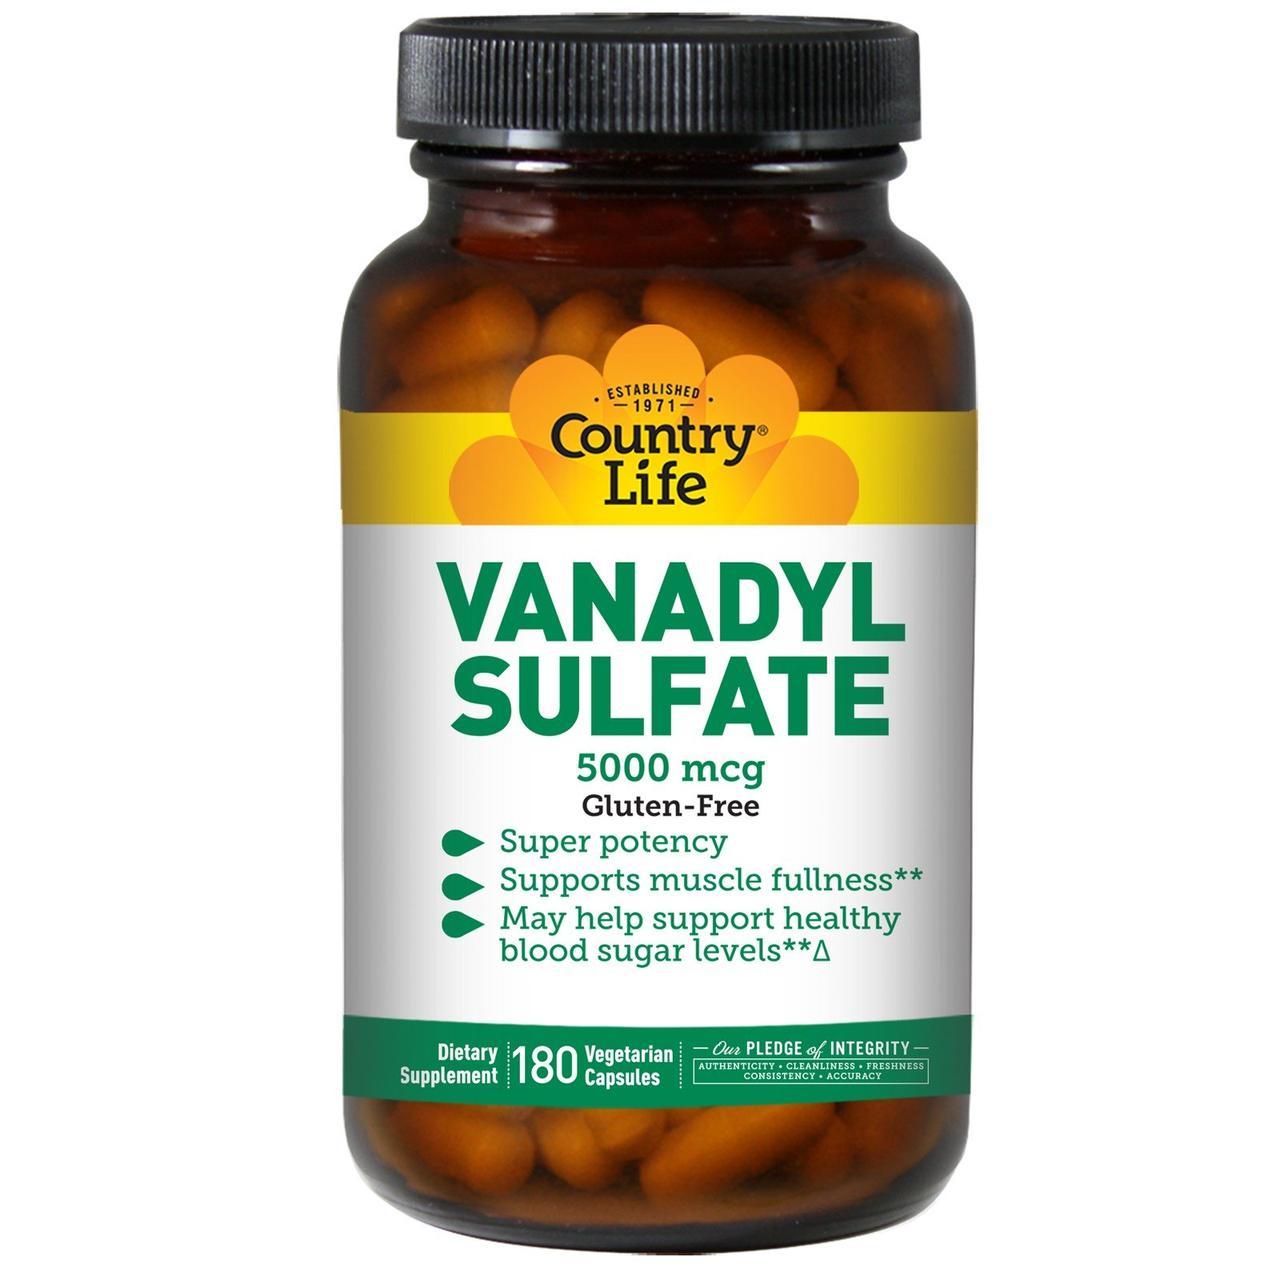 Ванадий Сульфат, Country Life, Vanadyl Sulfate, 5000 мкг, 180 капсул